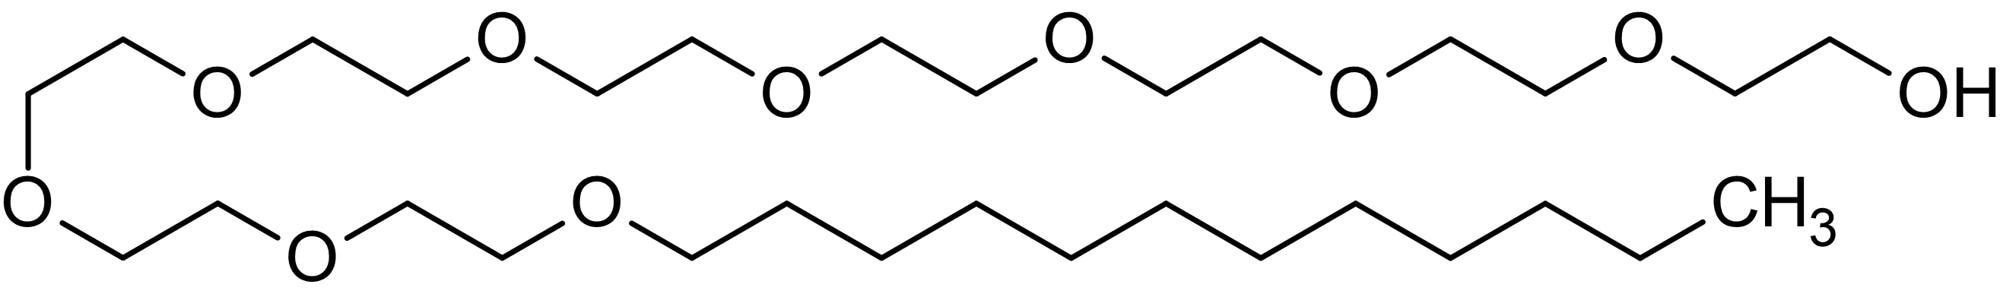 Chemical Structure - C12 E9, non-ionic surfactant (ab146545)